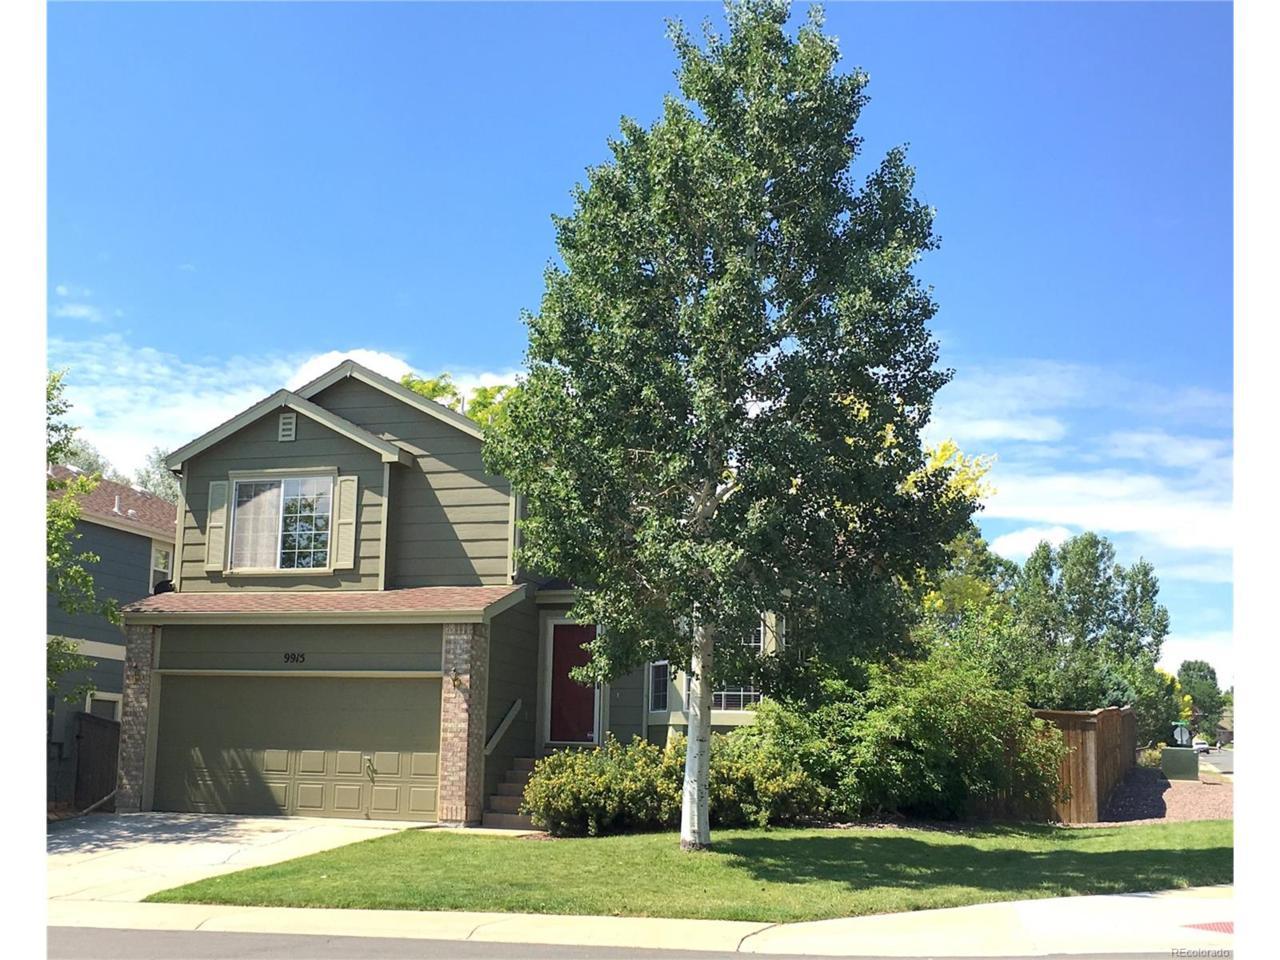 9915 Stonebriar Lane, Parker, CO 80134 (MLS #5917508) :: 8z Real Estate